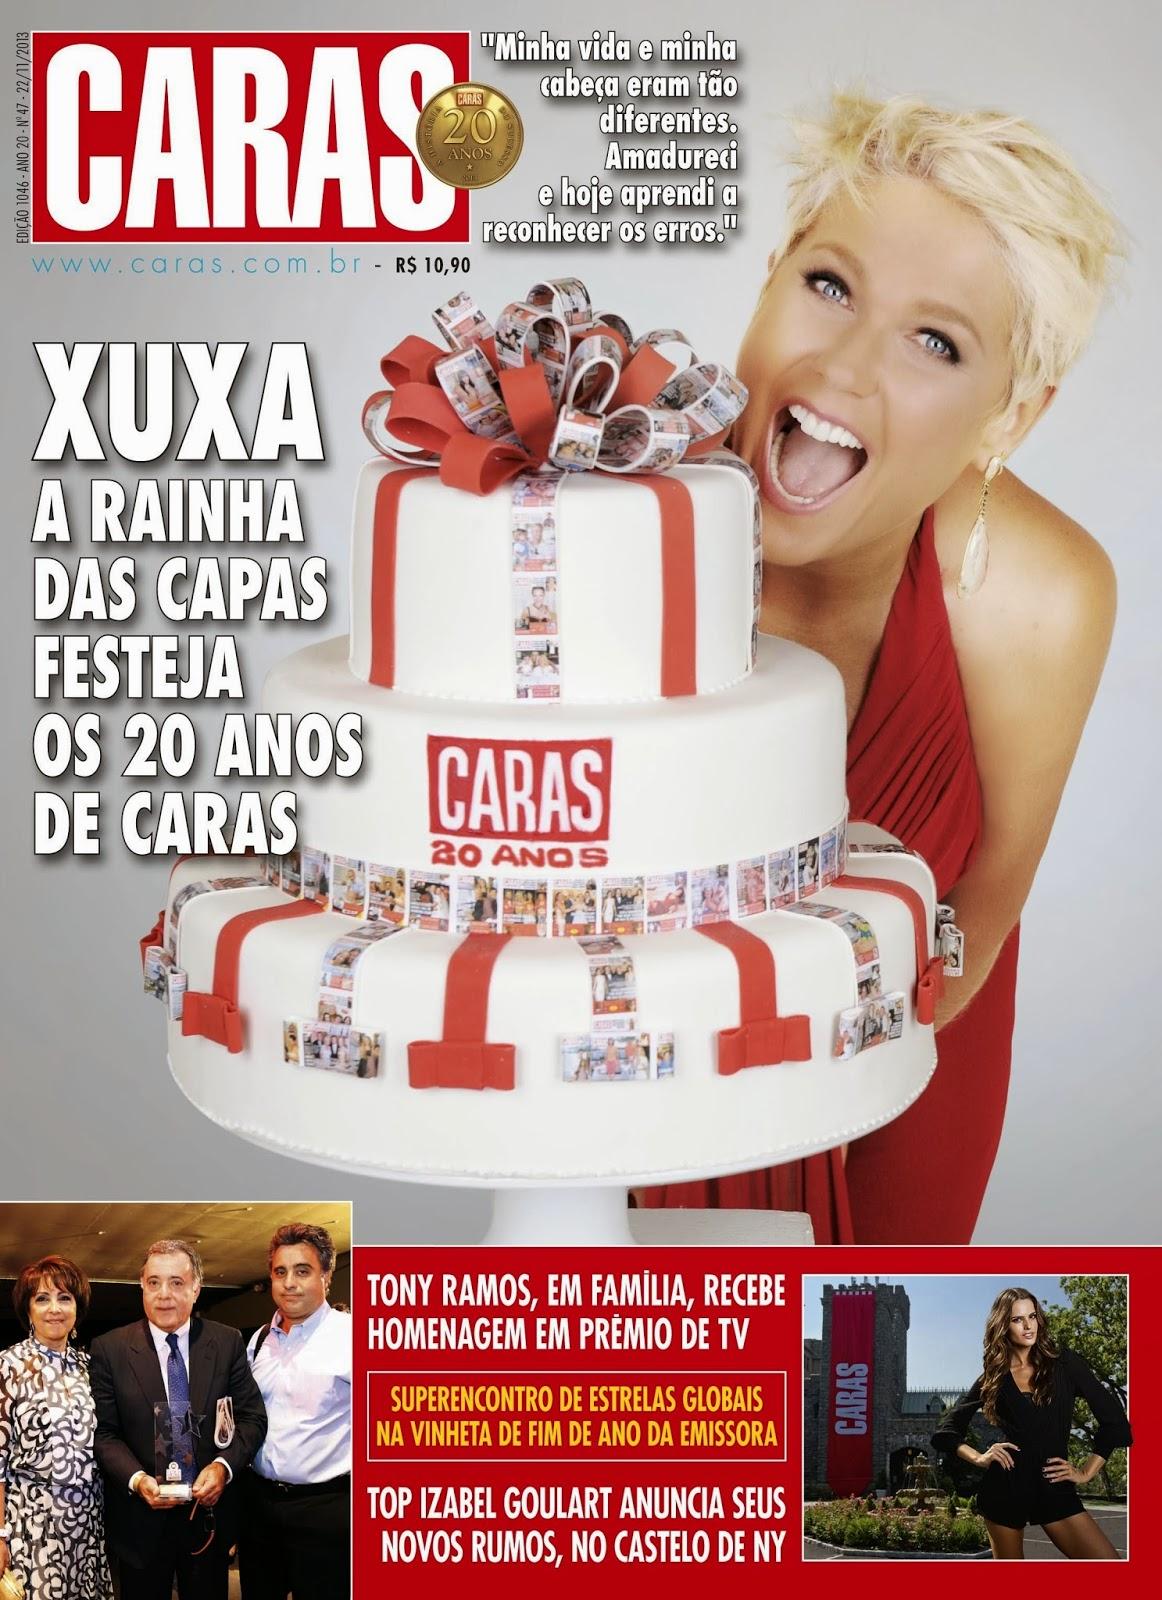 Xuxa Meneghel  Tony Ramos  Izabel Goulart  Caras Magazine Brazil    Xuxa Meneghel 2013